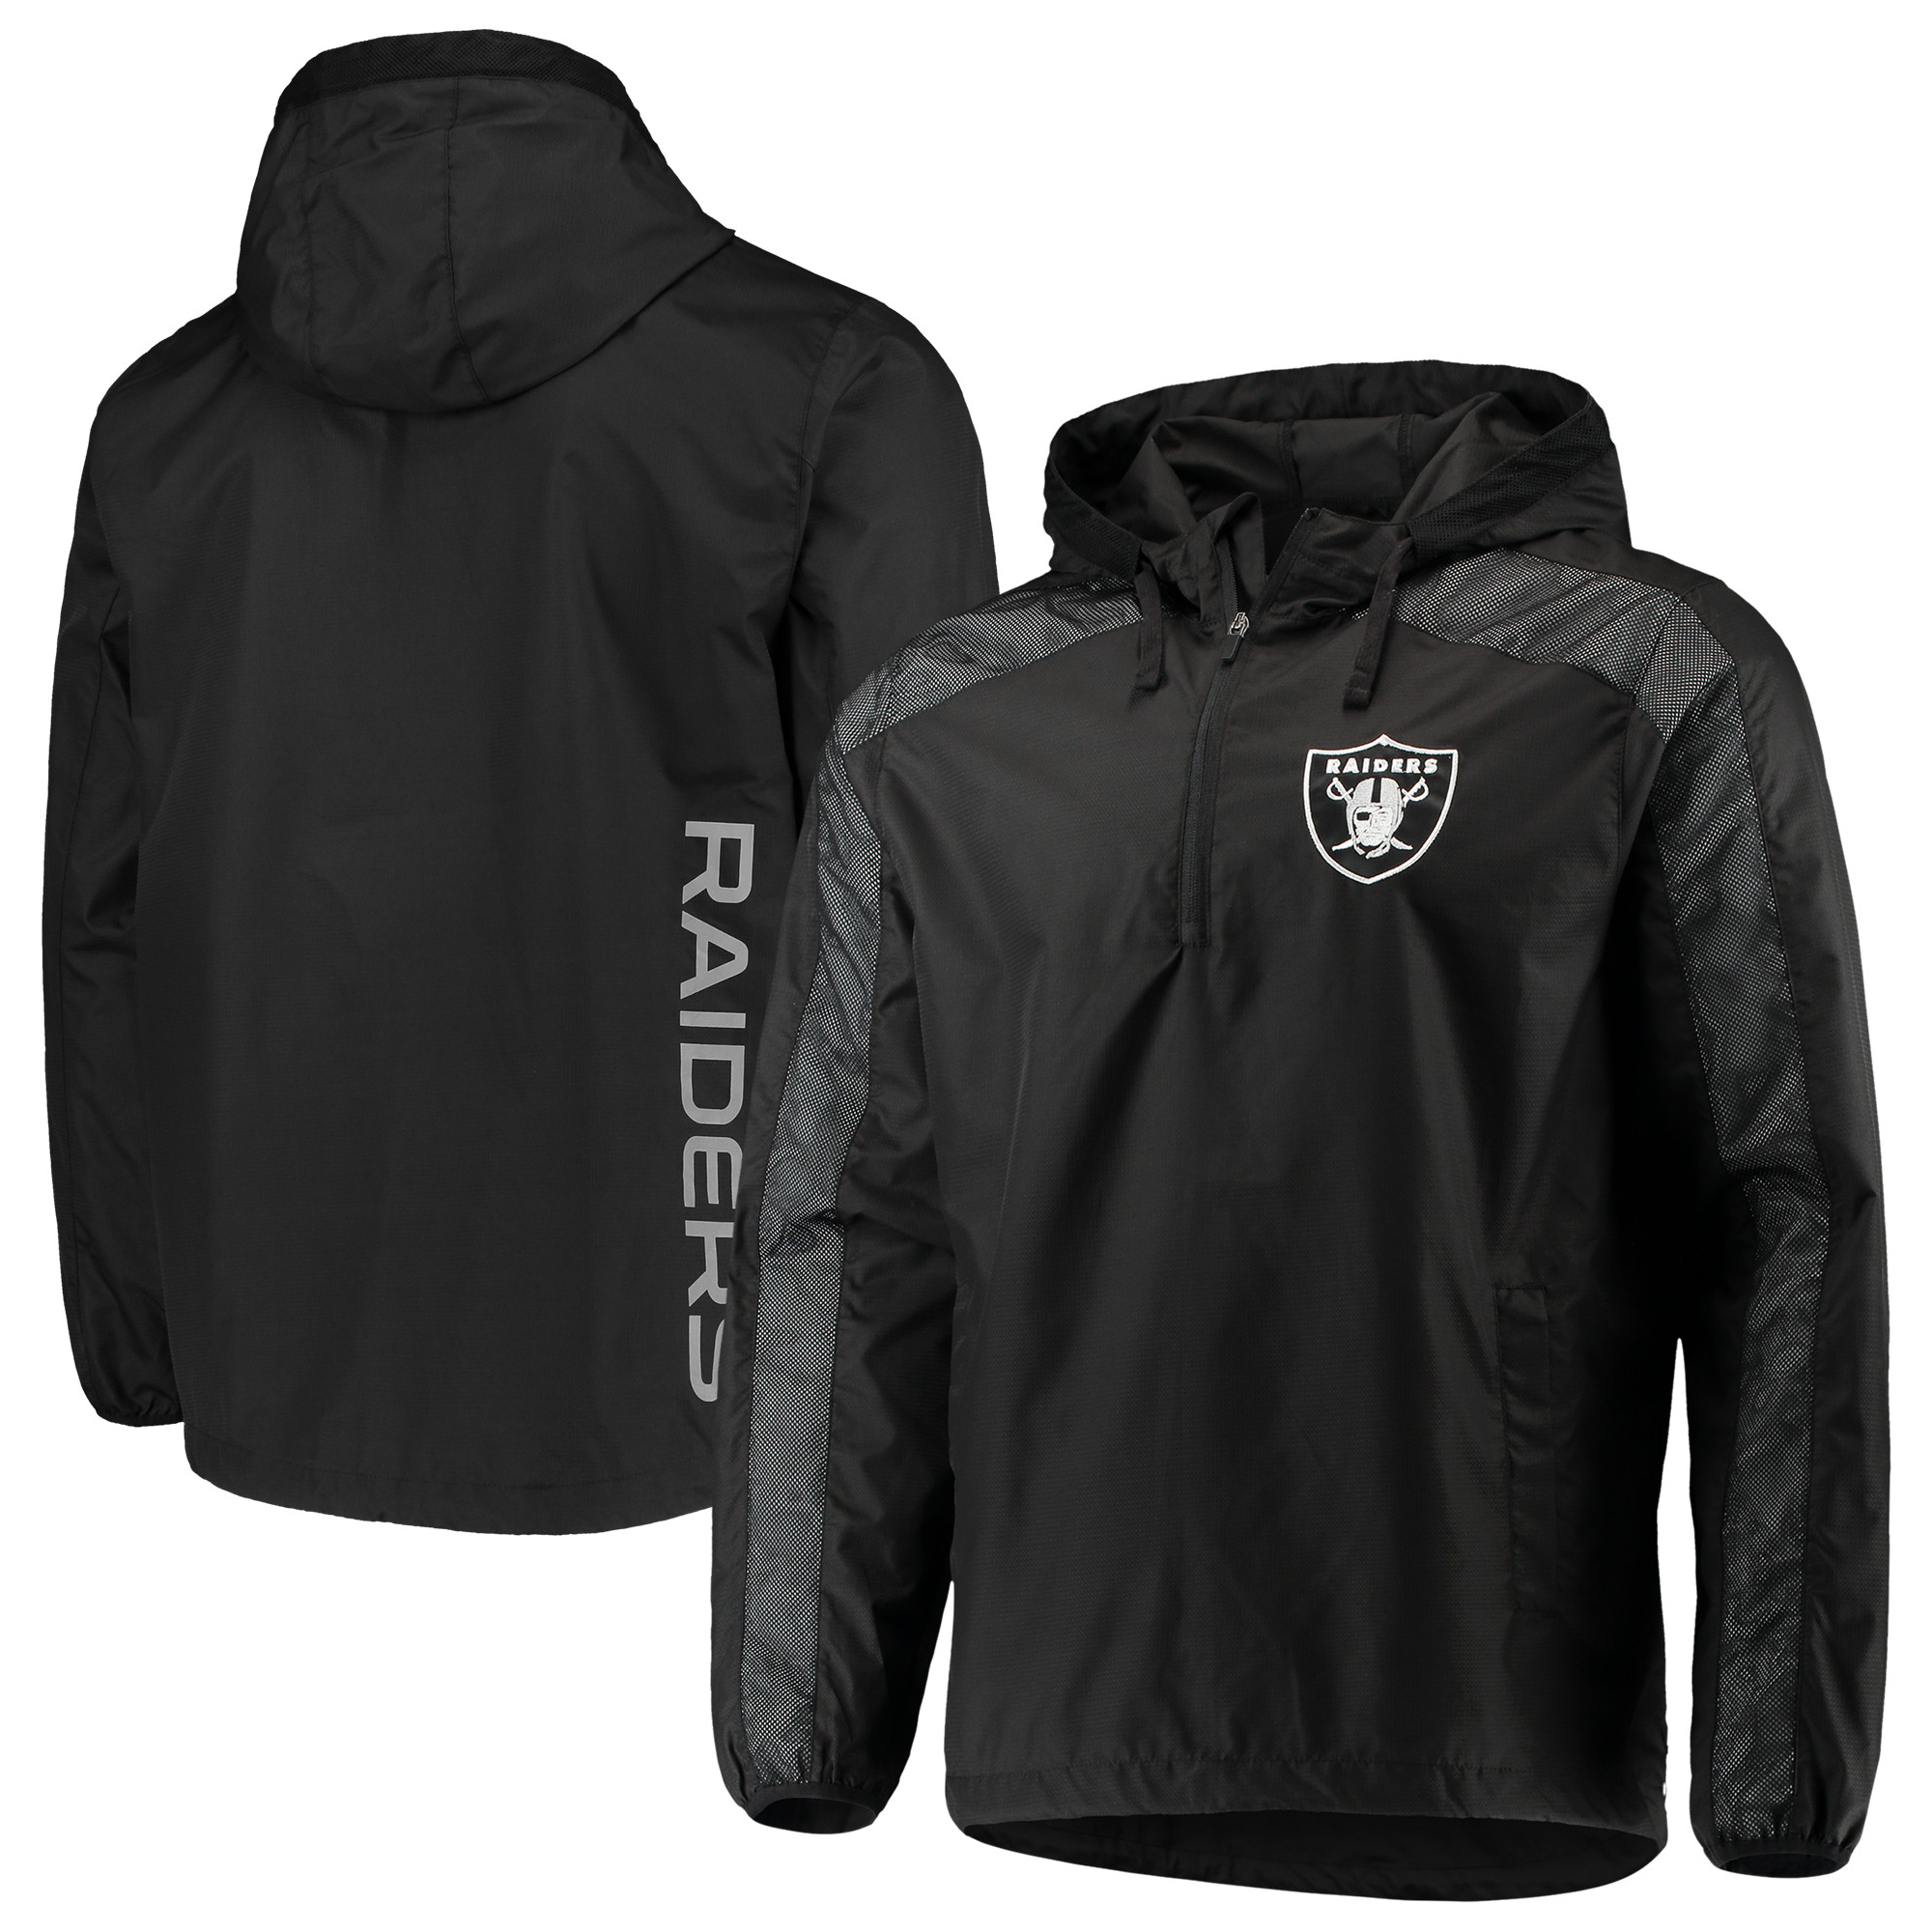 Oakland Raiders G-III Sports by Carl Banks Lineup Hooded Half-Zip Jacket - Black